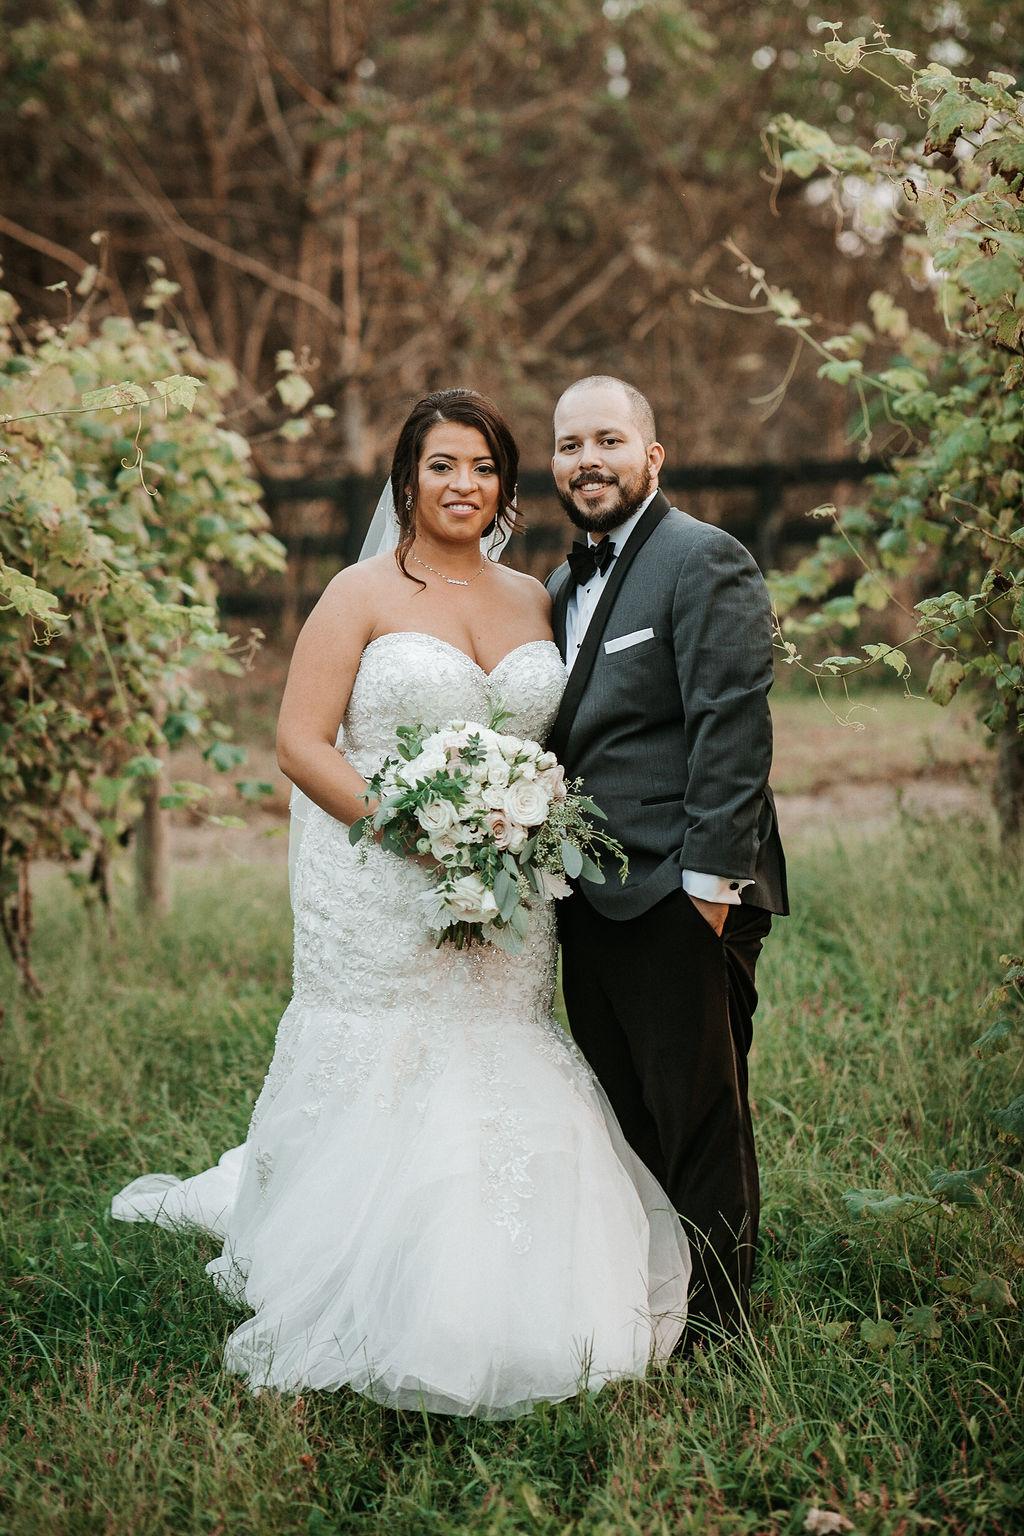 Bride and Groom Smiling in the Vineyards at Blue Valley Vineyard